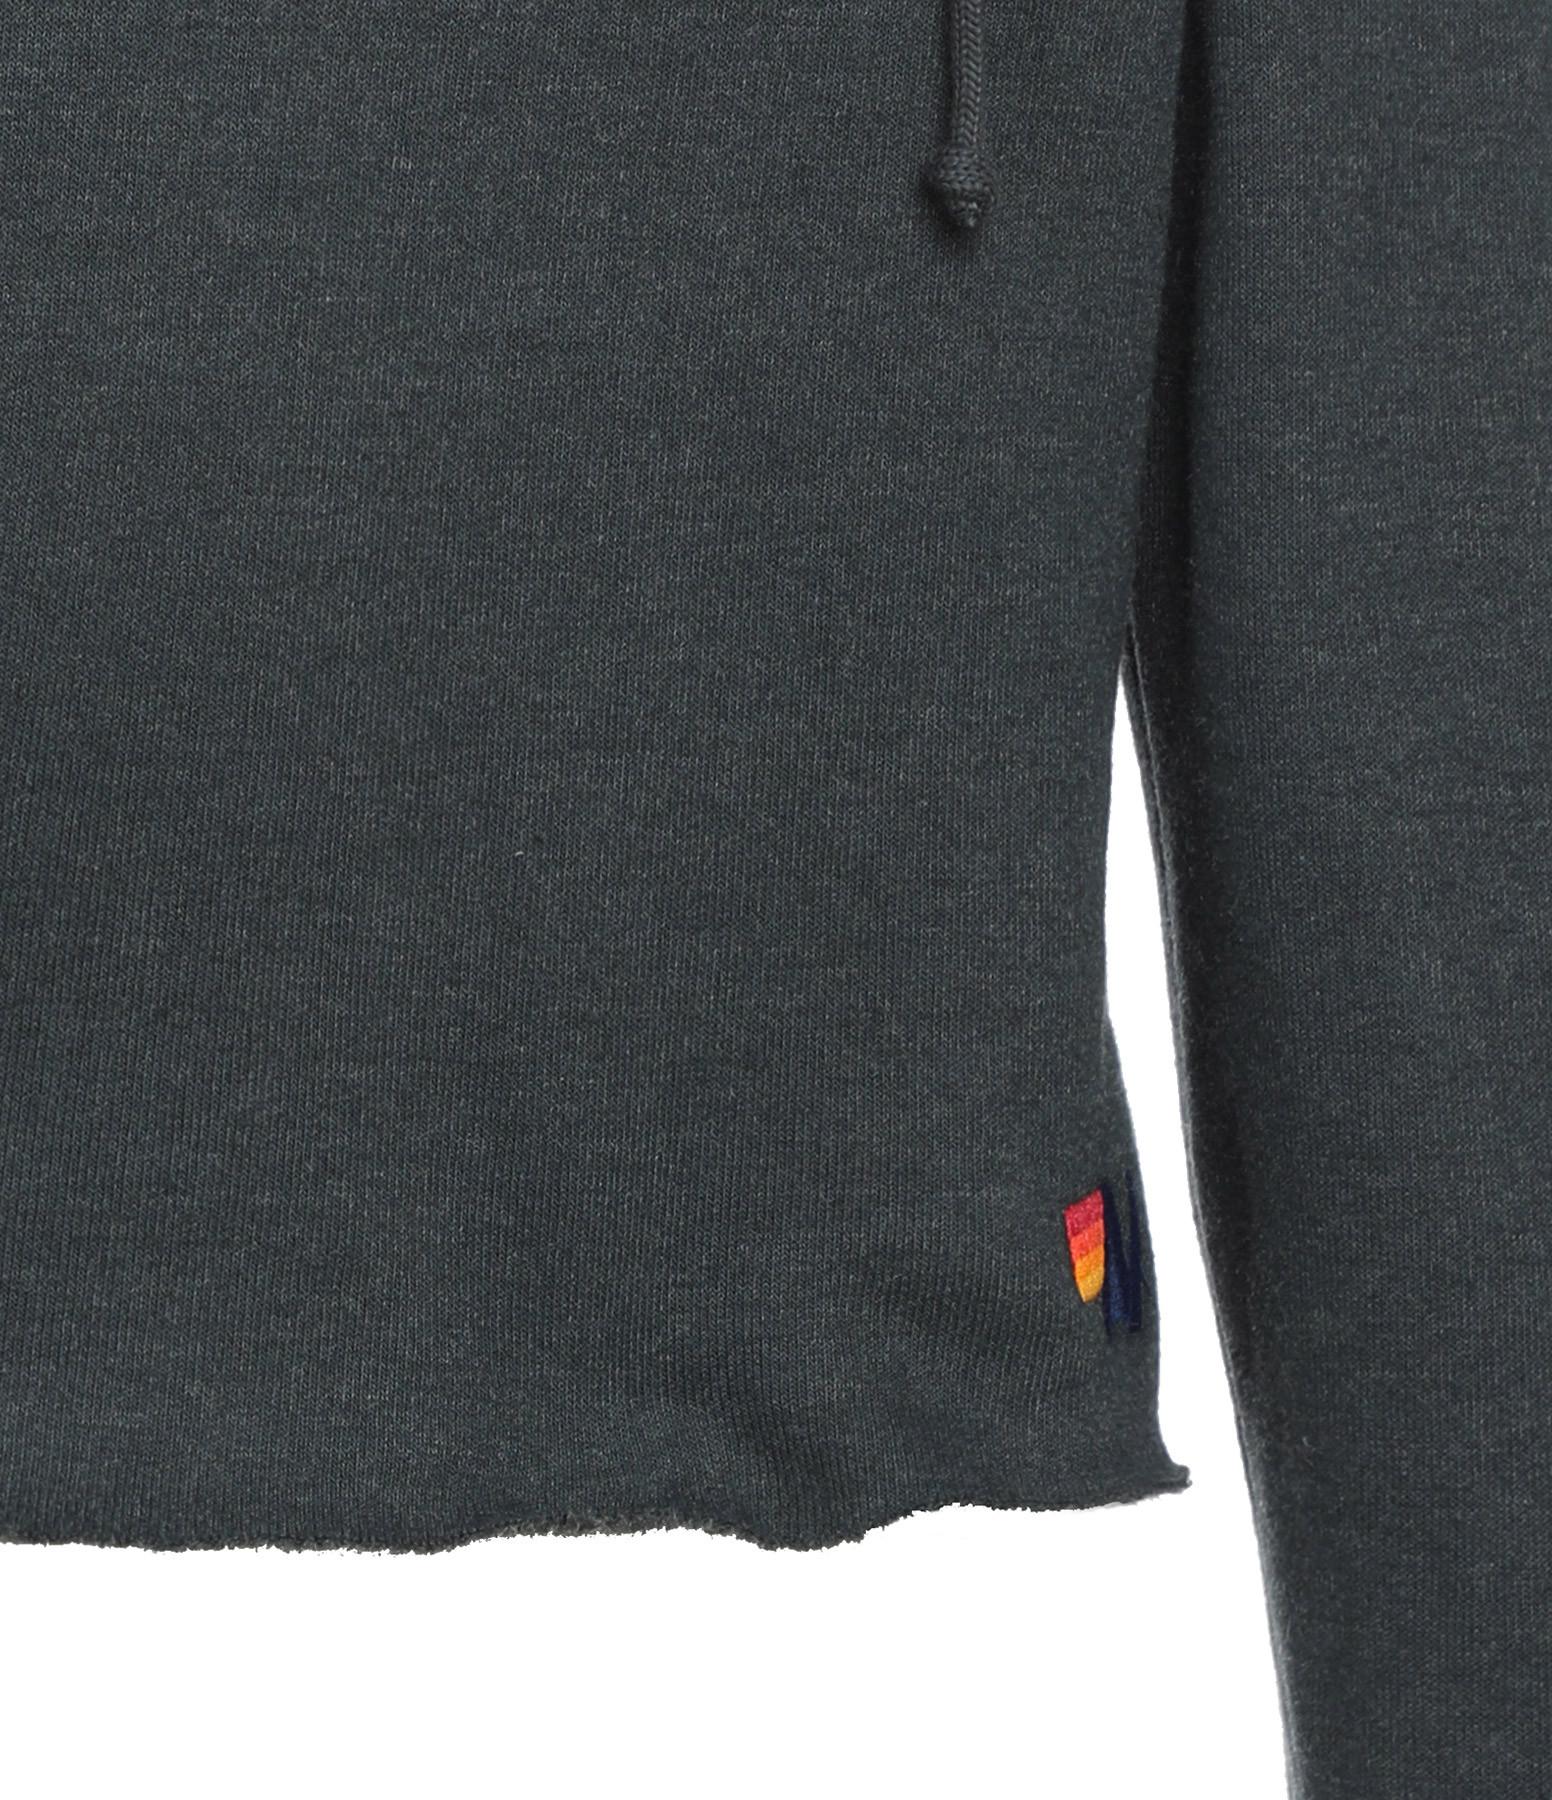 AVIATOR NATION - Sweatshirt Bolt Crop Charbon Néon